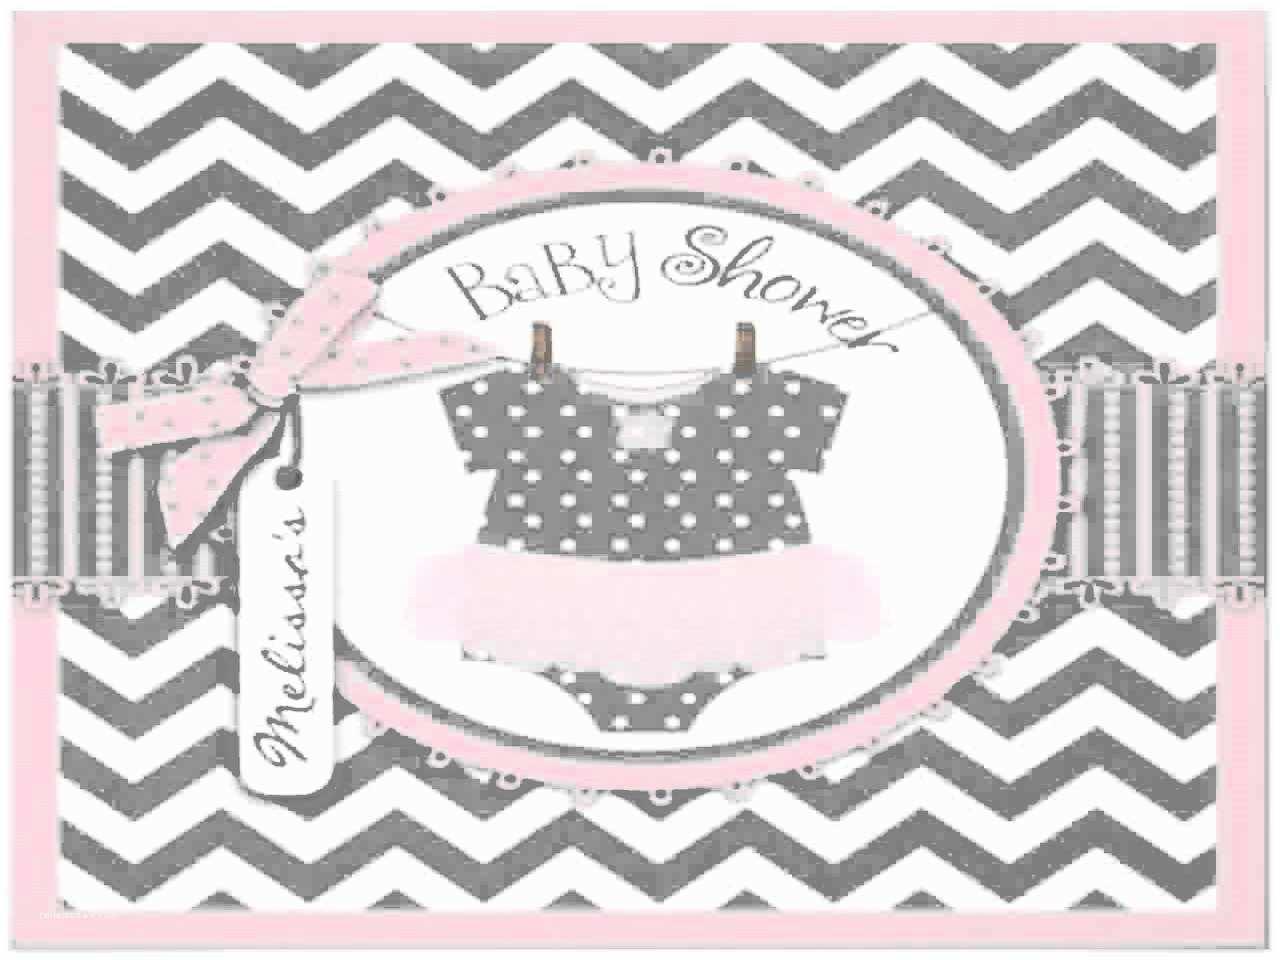 Hobby Lobby Baby Shower Invitations Hobby Lobby Baby Shower Invitations – Gangcraft